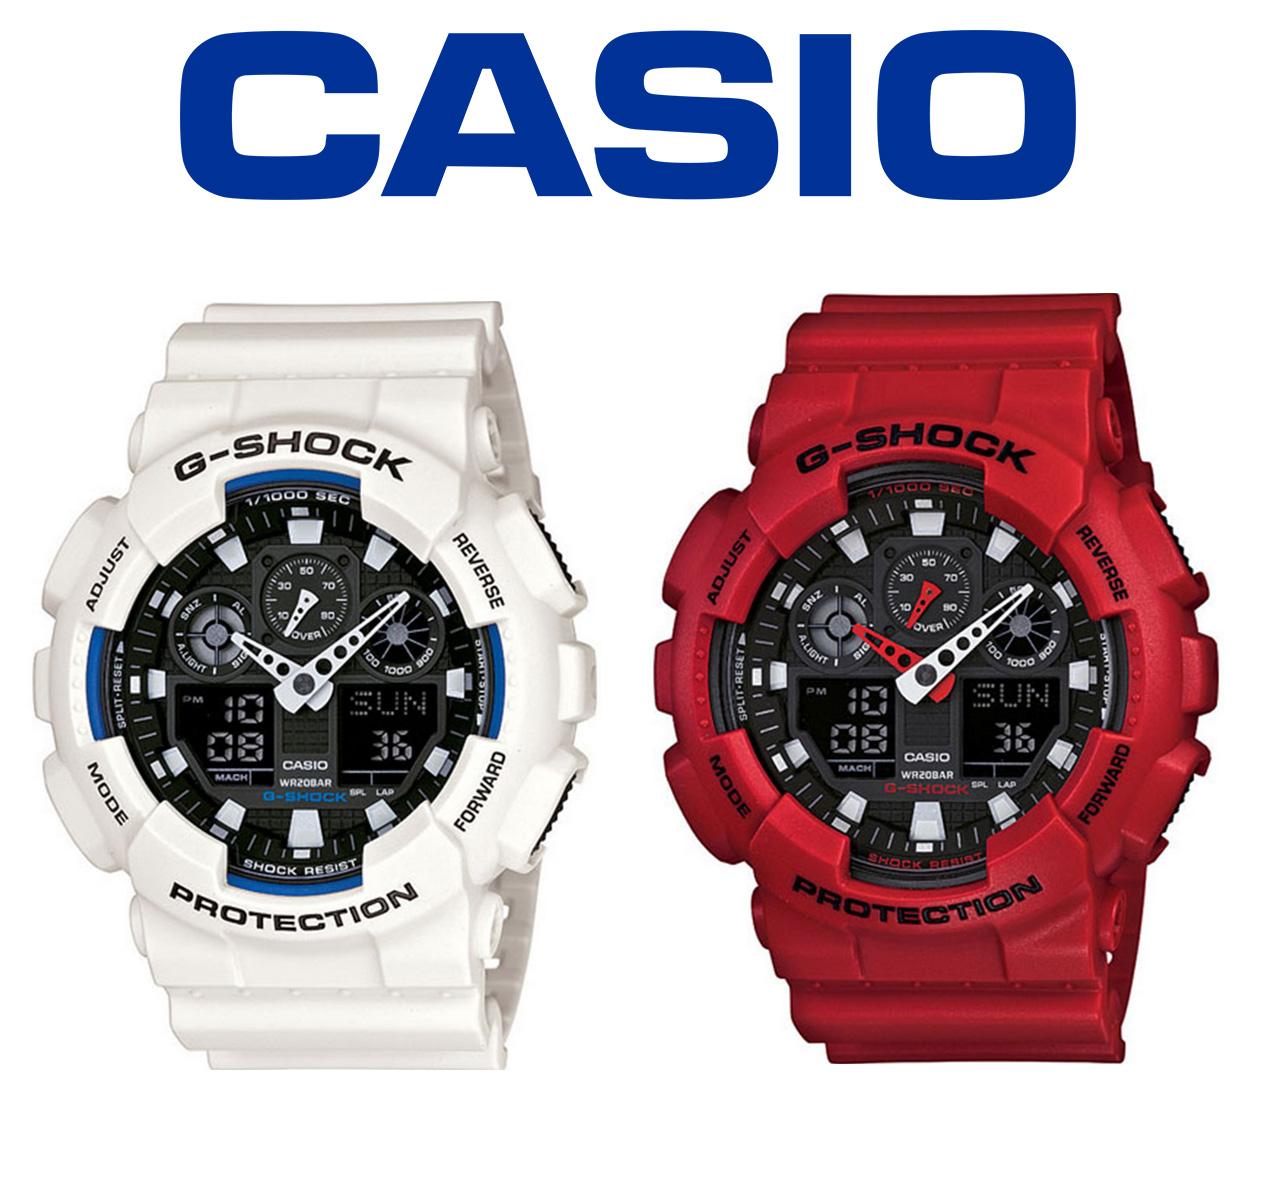 3d8cc458bb99 Casio G-Shock Mens Quartz Wrist Watch Red White Resin Band Analog ...